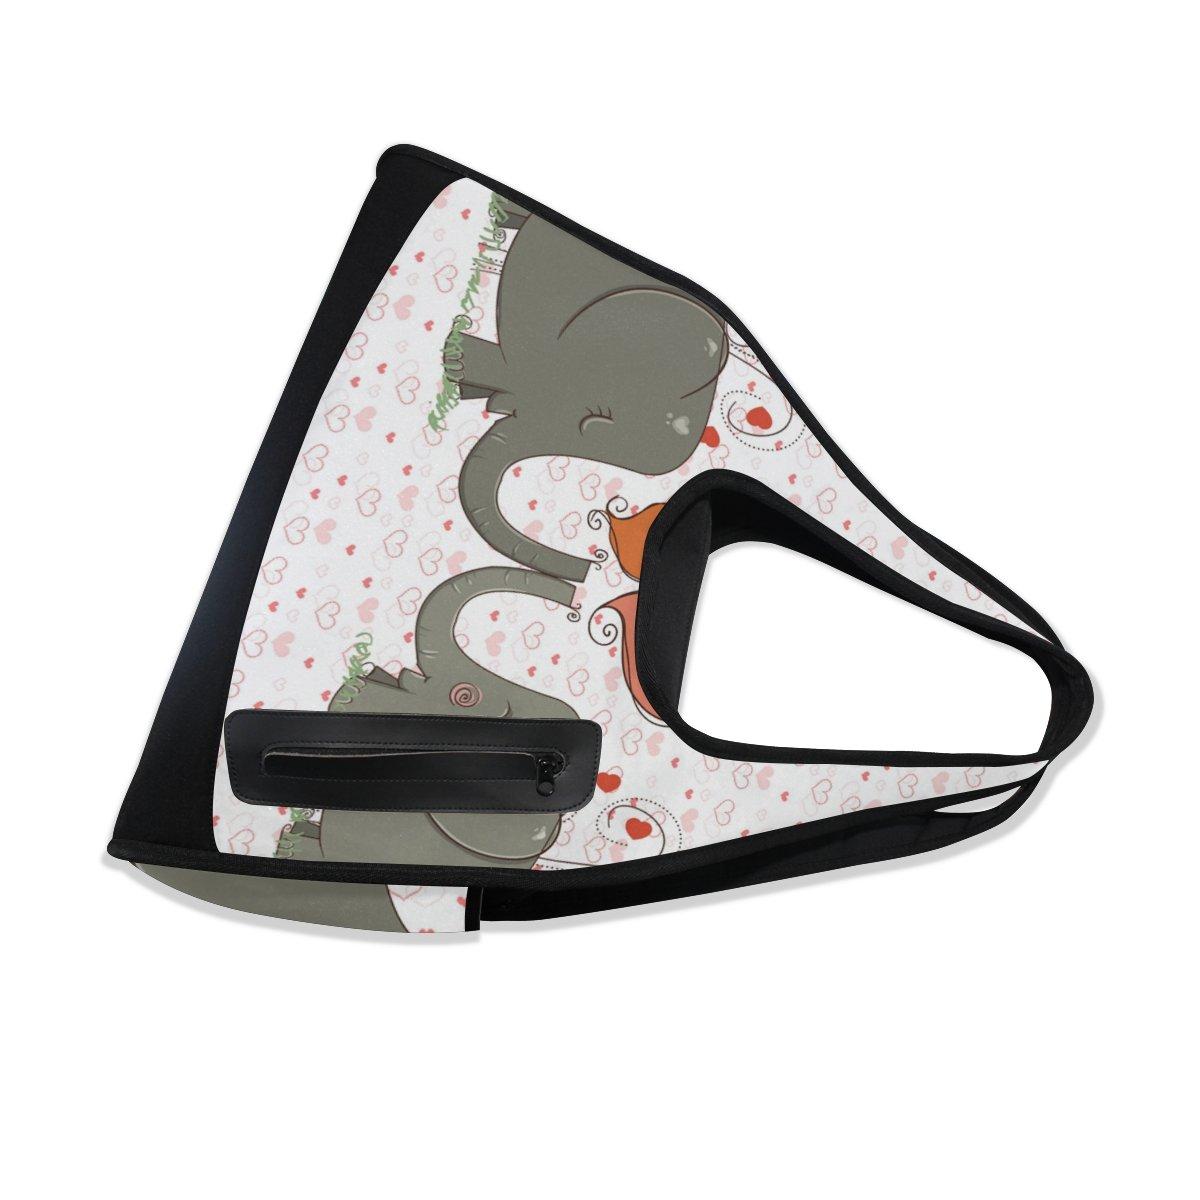 AHOMY Sports Gym Bag Elephant Love Heart Duffel Bag Travel Shoulder Bag by AHOMY (Image #6)